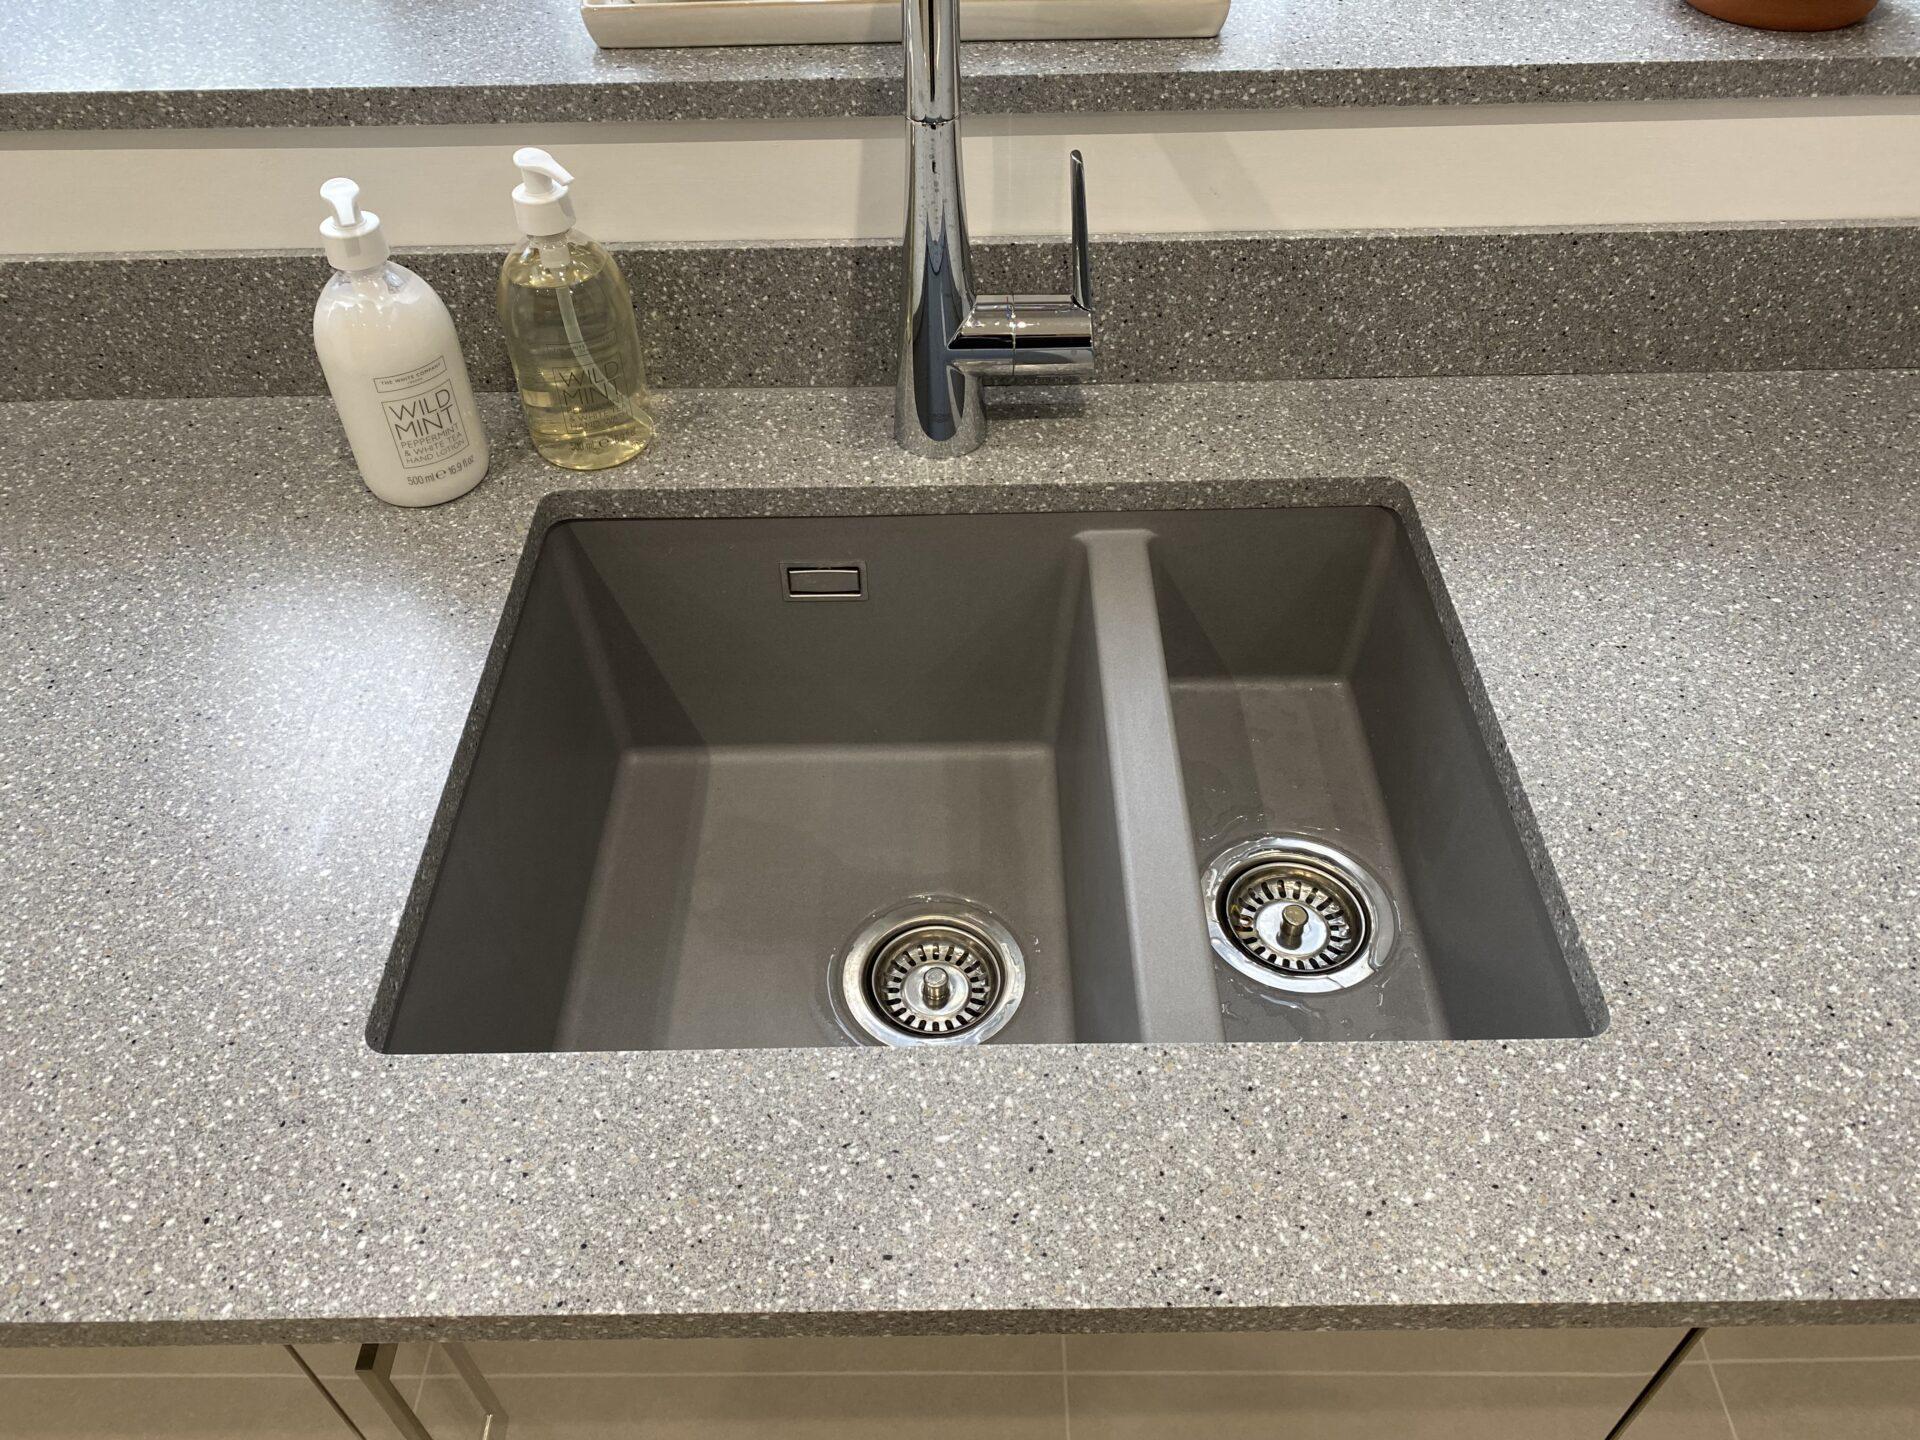 Undermount kitchen sink set in solid acrylic work surface